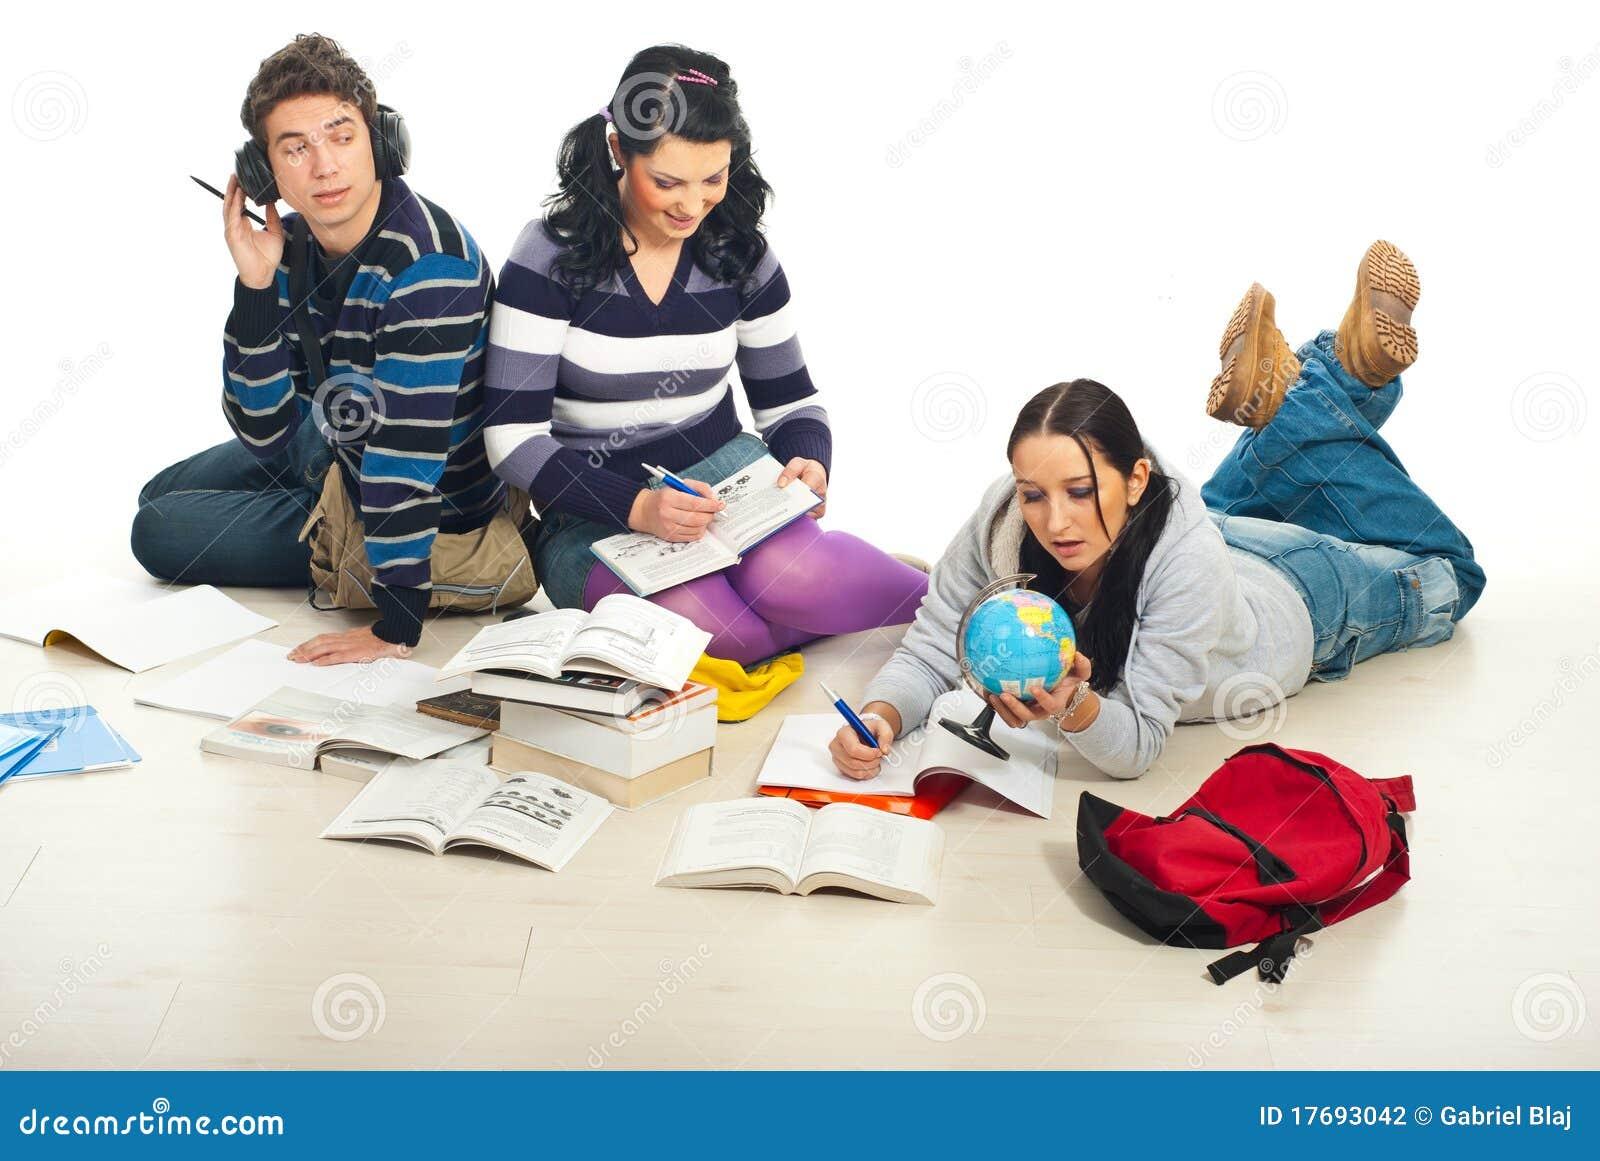 research paper writing skills pdf